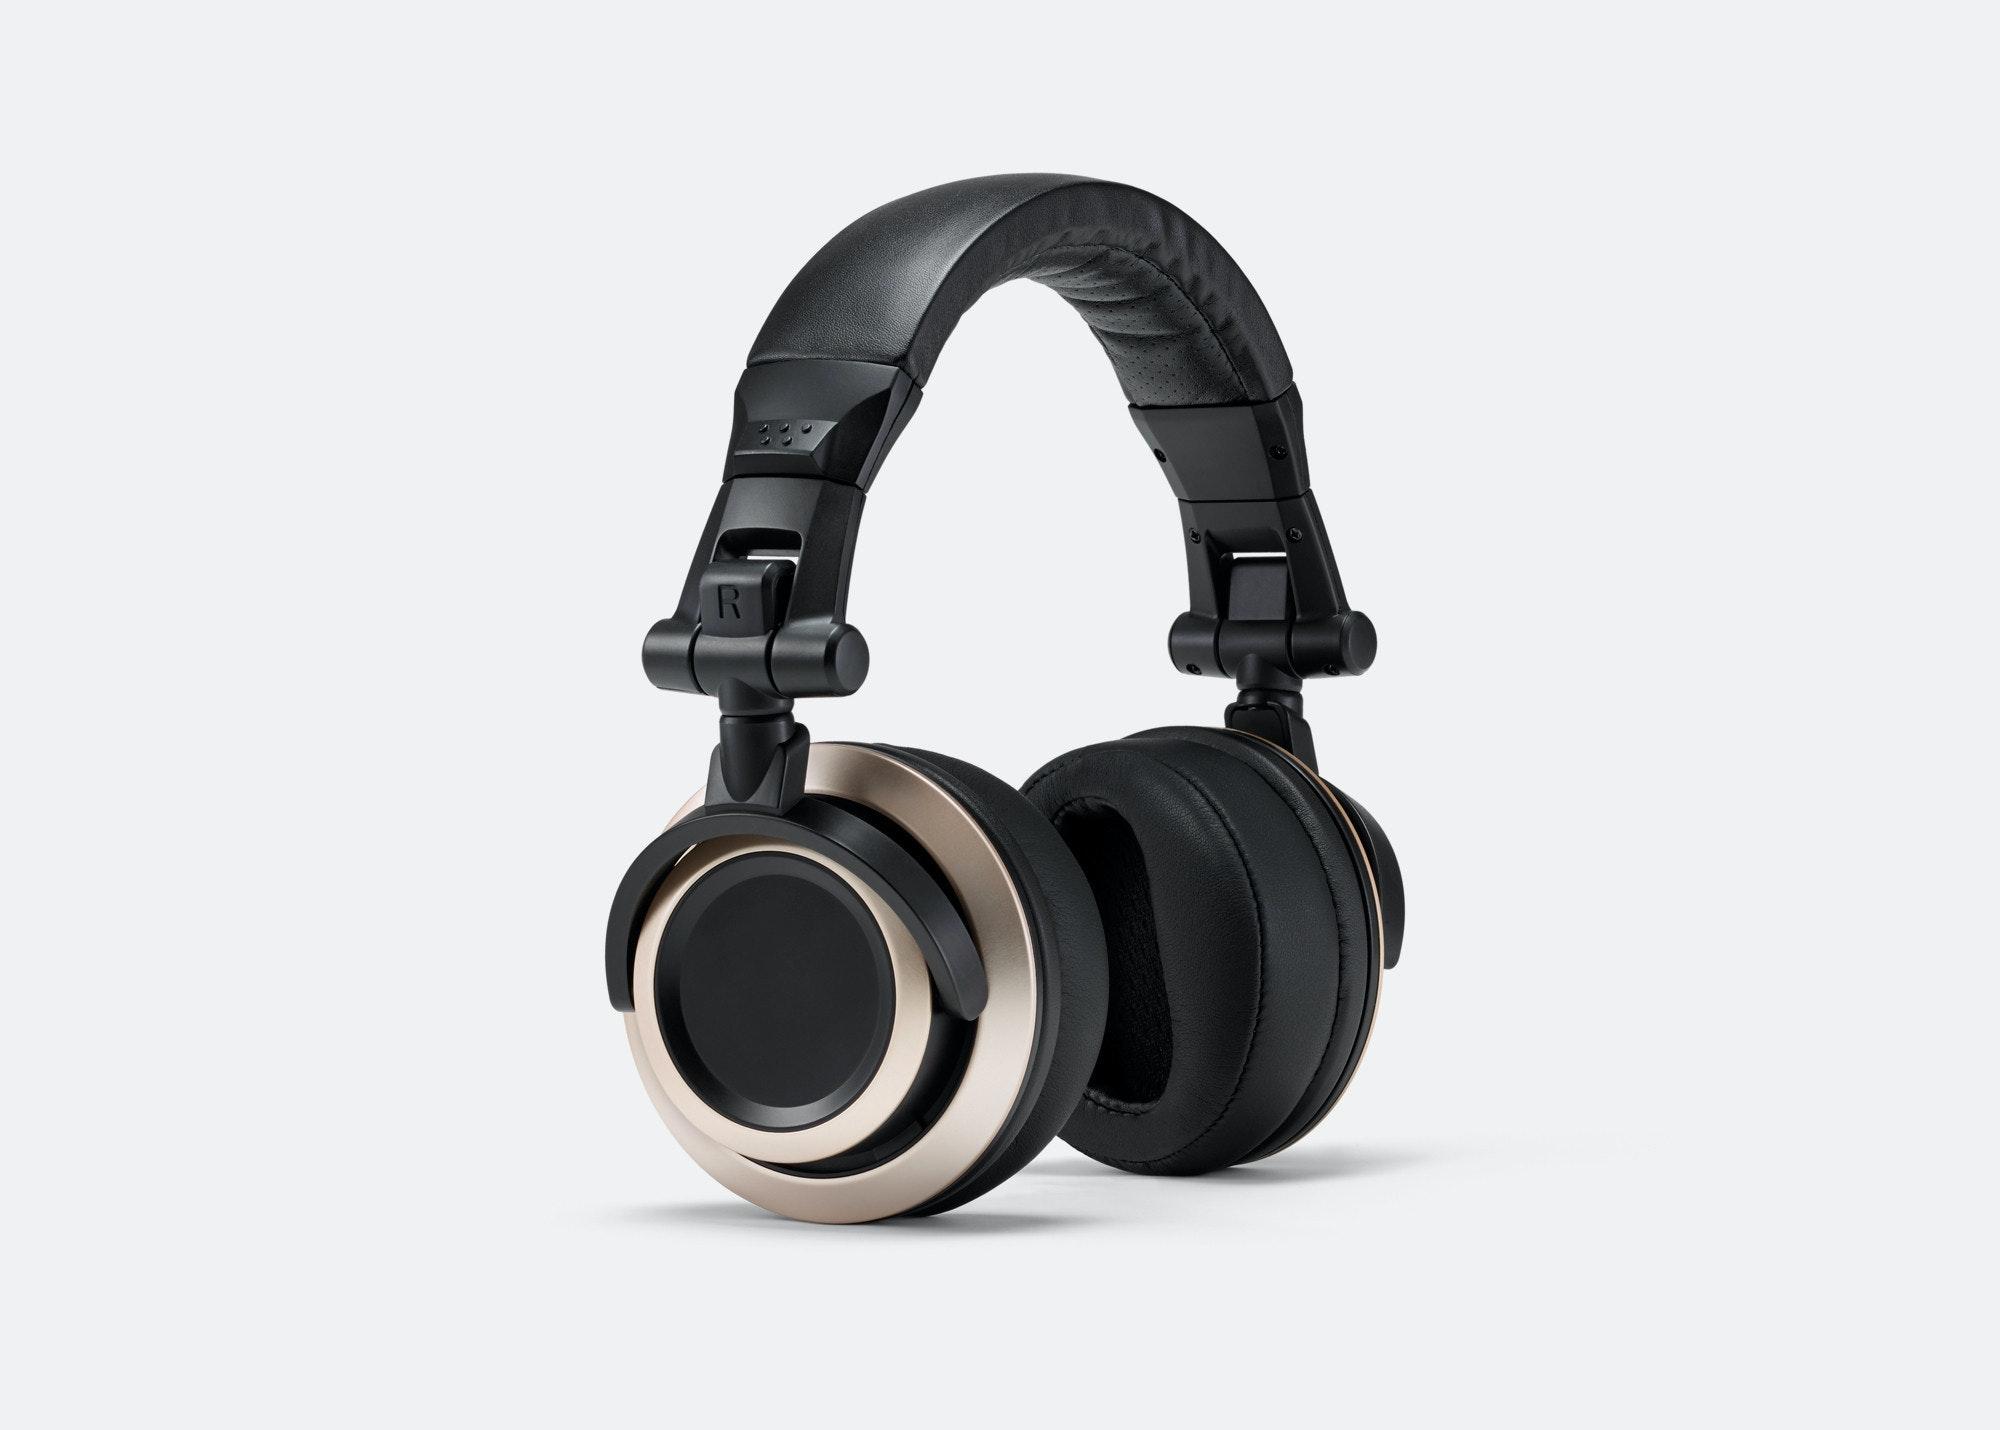 CB-1 Studio Headphones by Status Audio